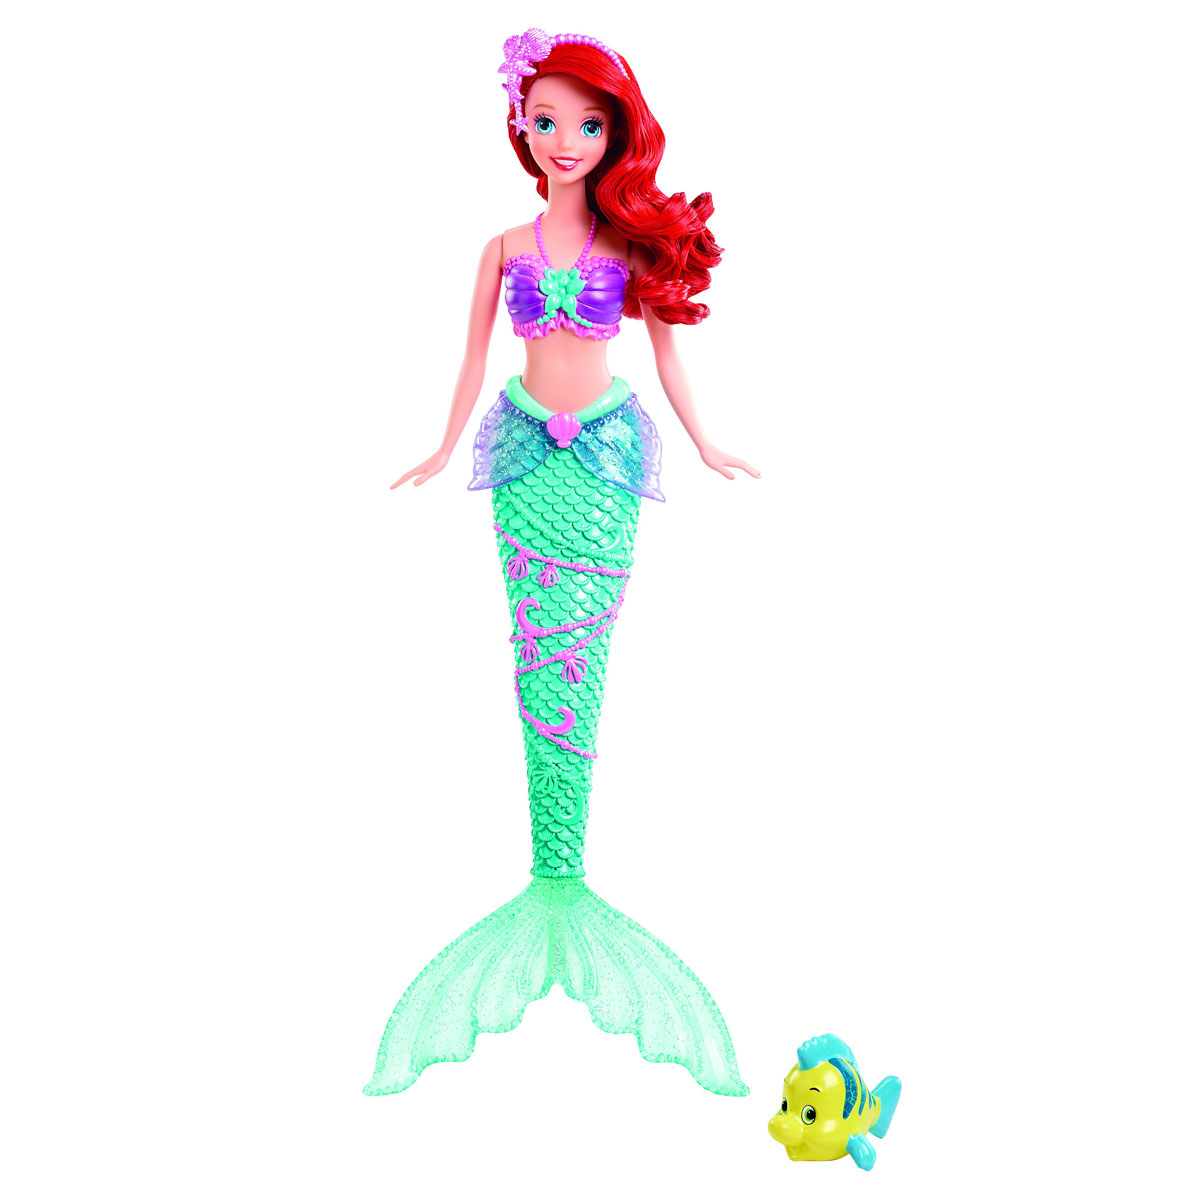 Disney Princess Кукла Русалочка Ариель c фонтанчиком и рыбка Флаундер, Mattel